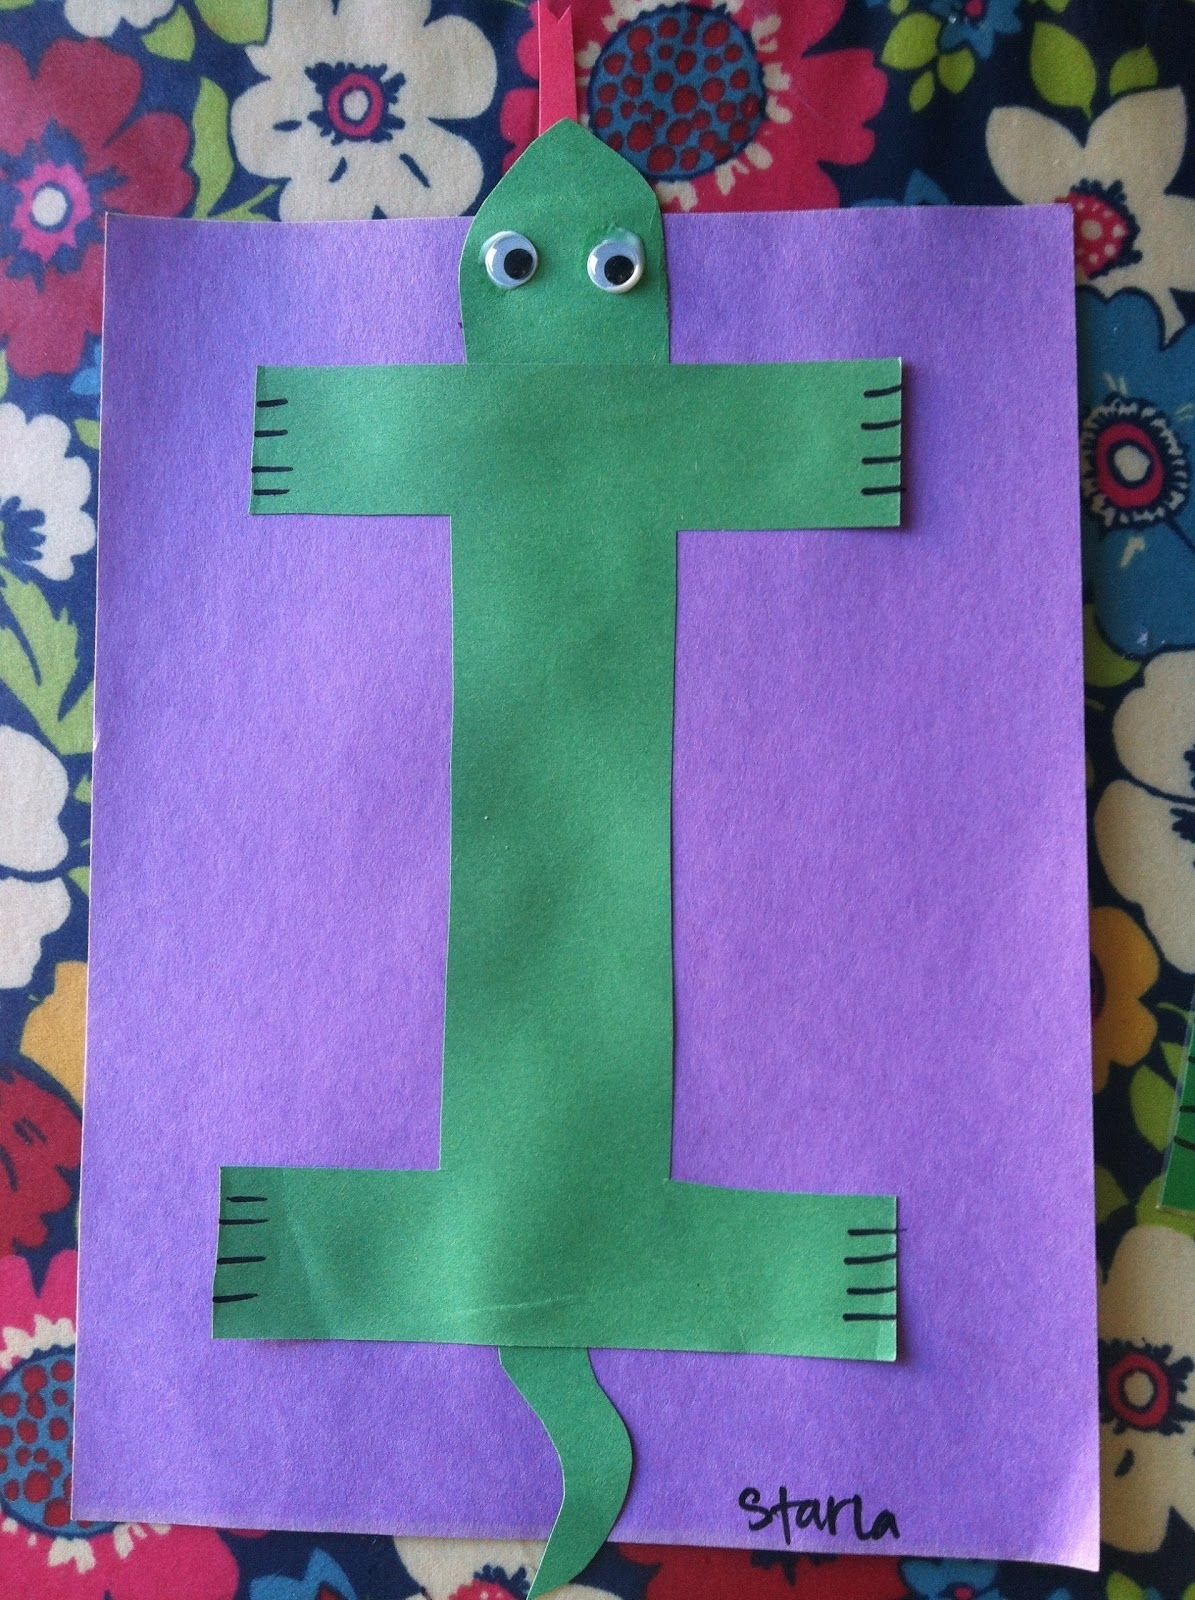 Miss marens monkeys preschool iguana template art activities miss marens monkeys preschool iguana template letters kindergarten spiritdancerdesigns Gallery